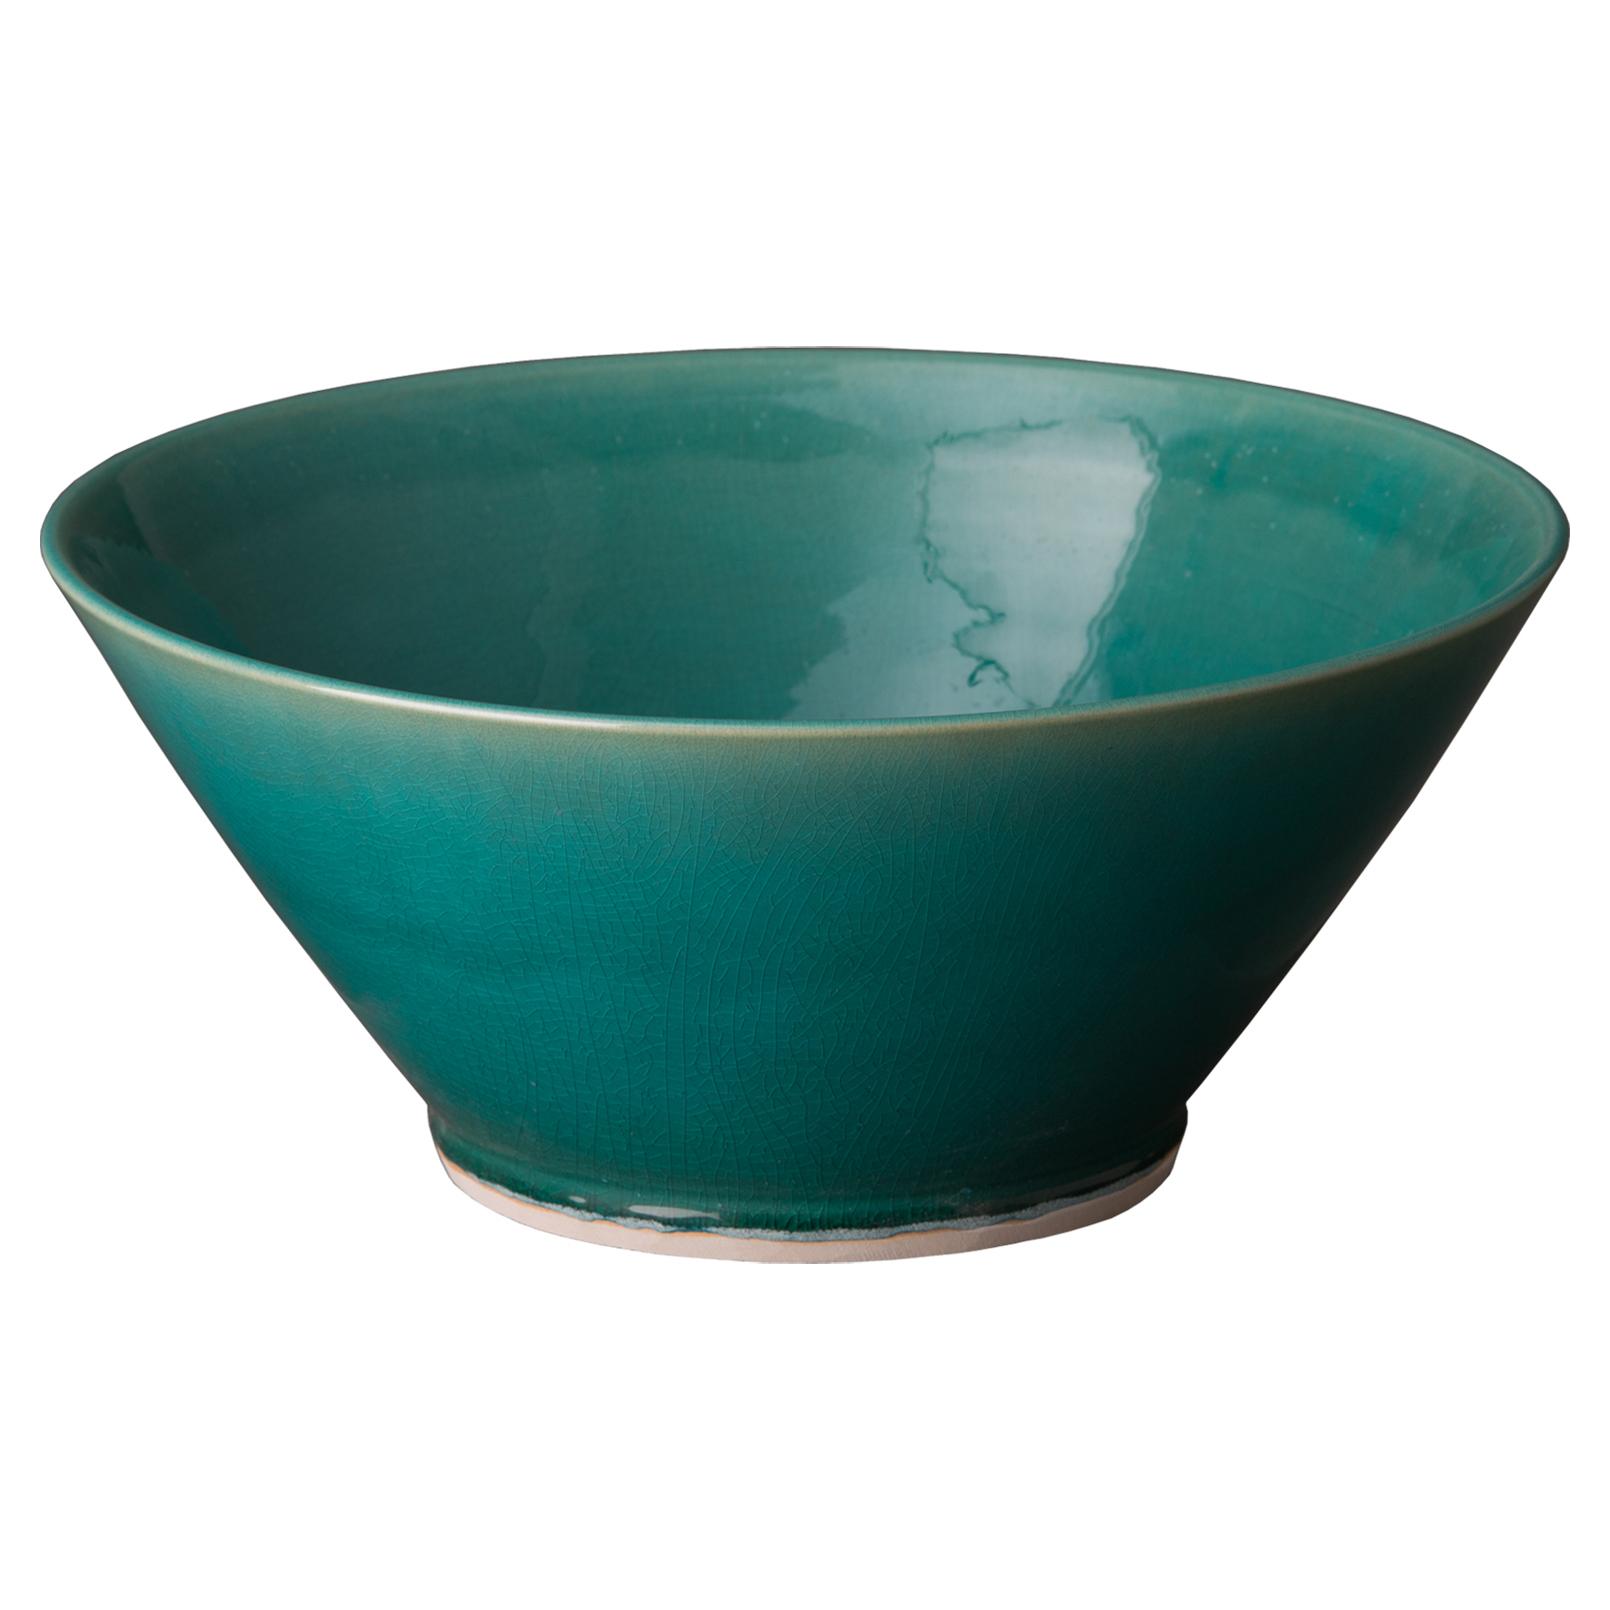 Bazaar Peacock Green Glazed Ceramic Bowl